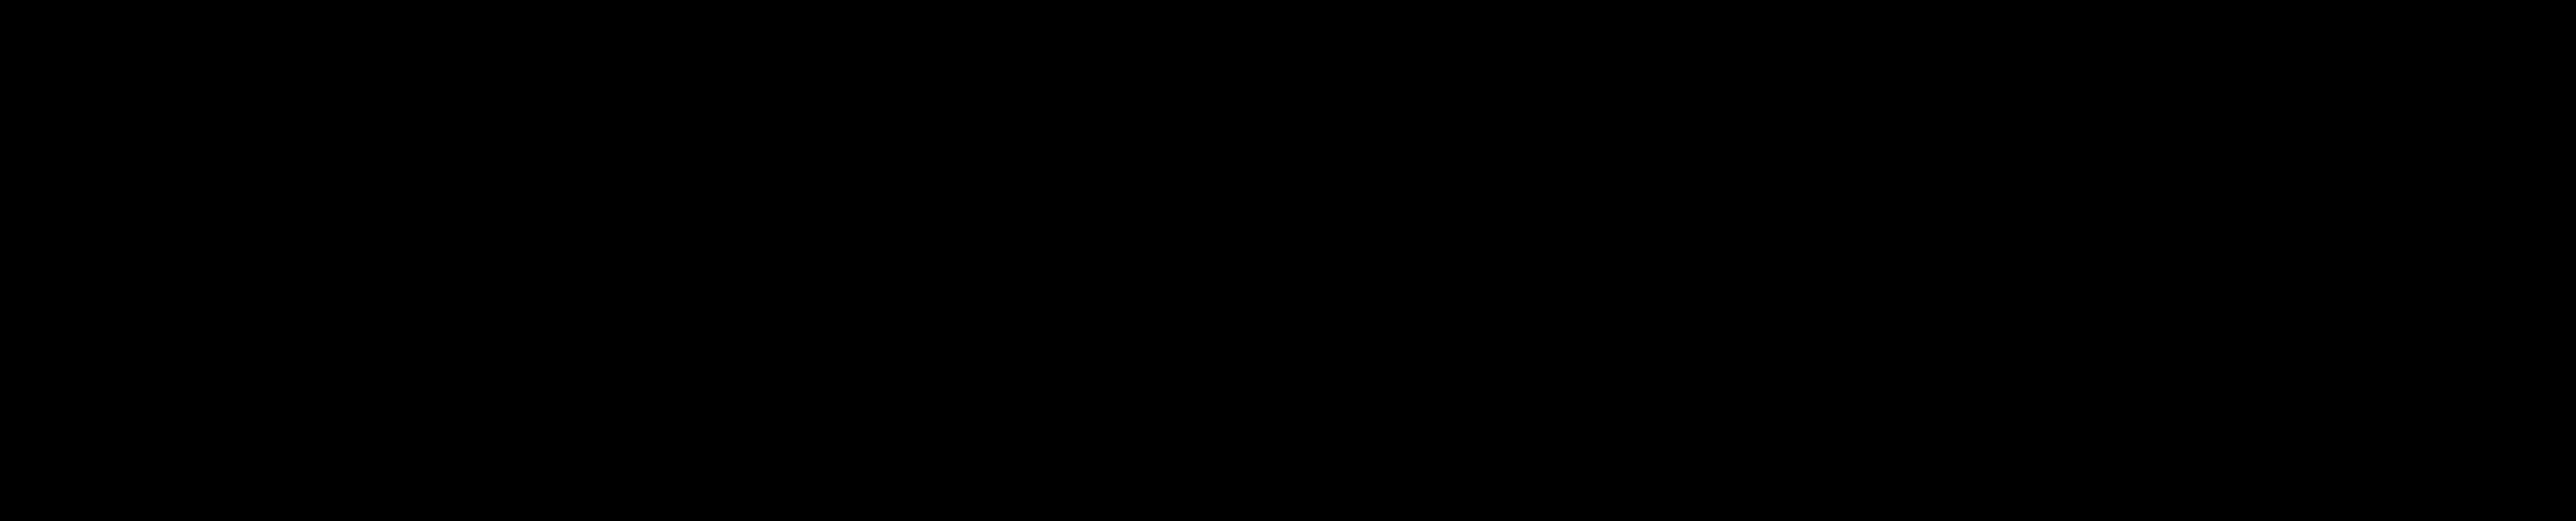 https://acessodigital.com/wp-content/uploads/2020/05/vivara-logo.png